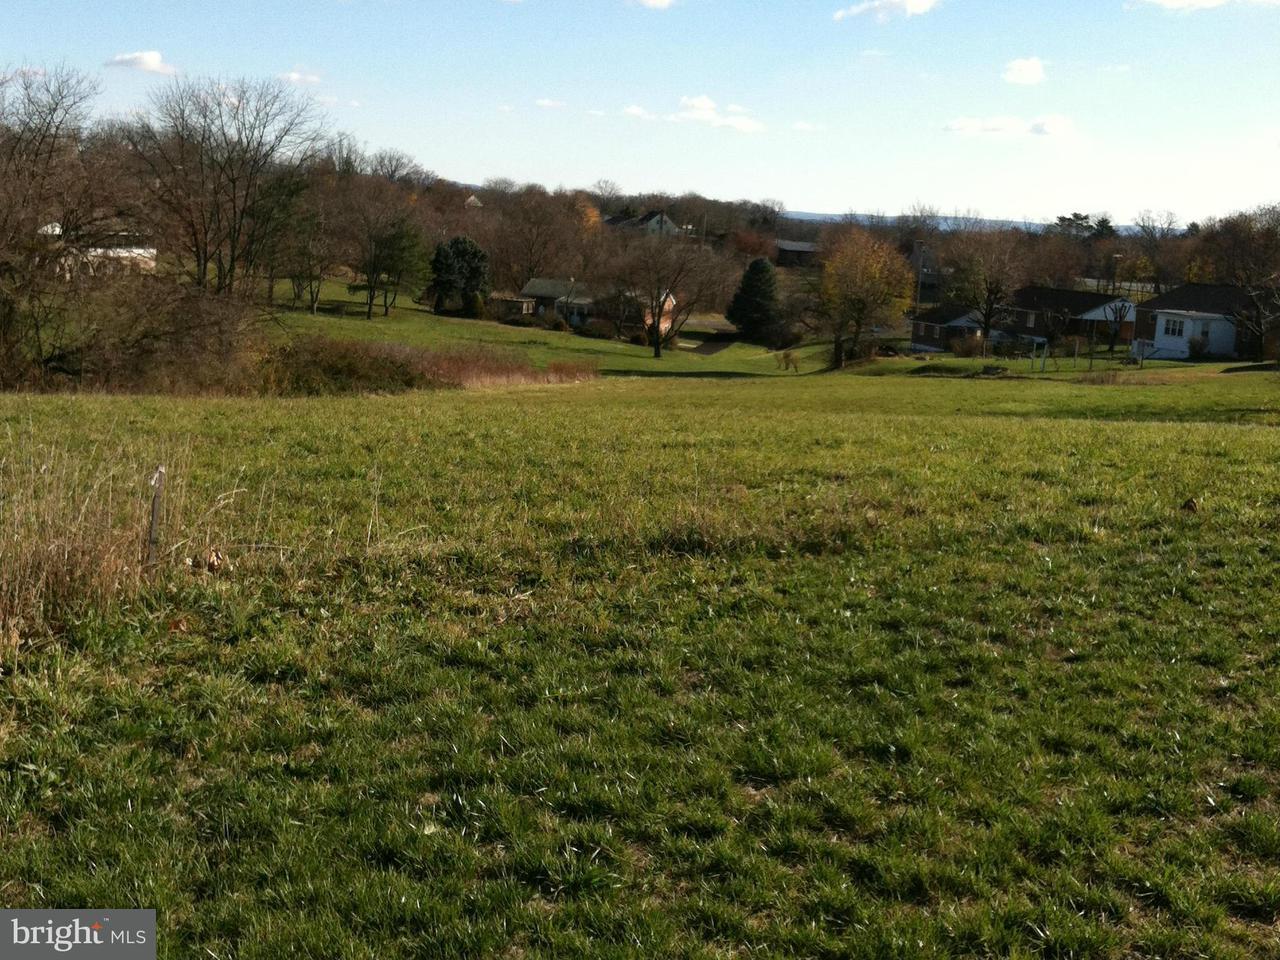 Land for Sale at 12 Lots Maranatha Dr St. Thomas, Pennsylvania 17252 United States